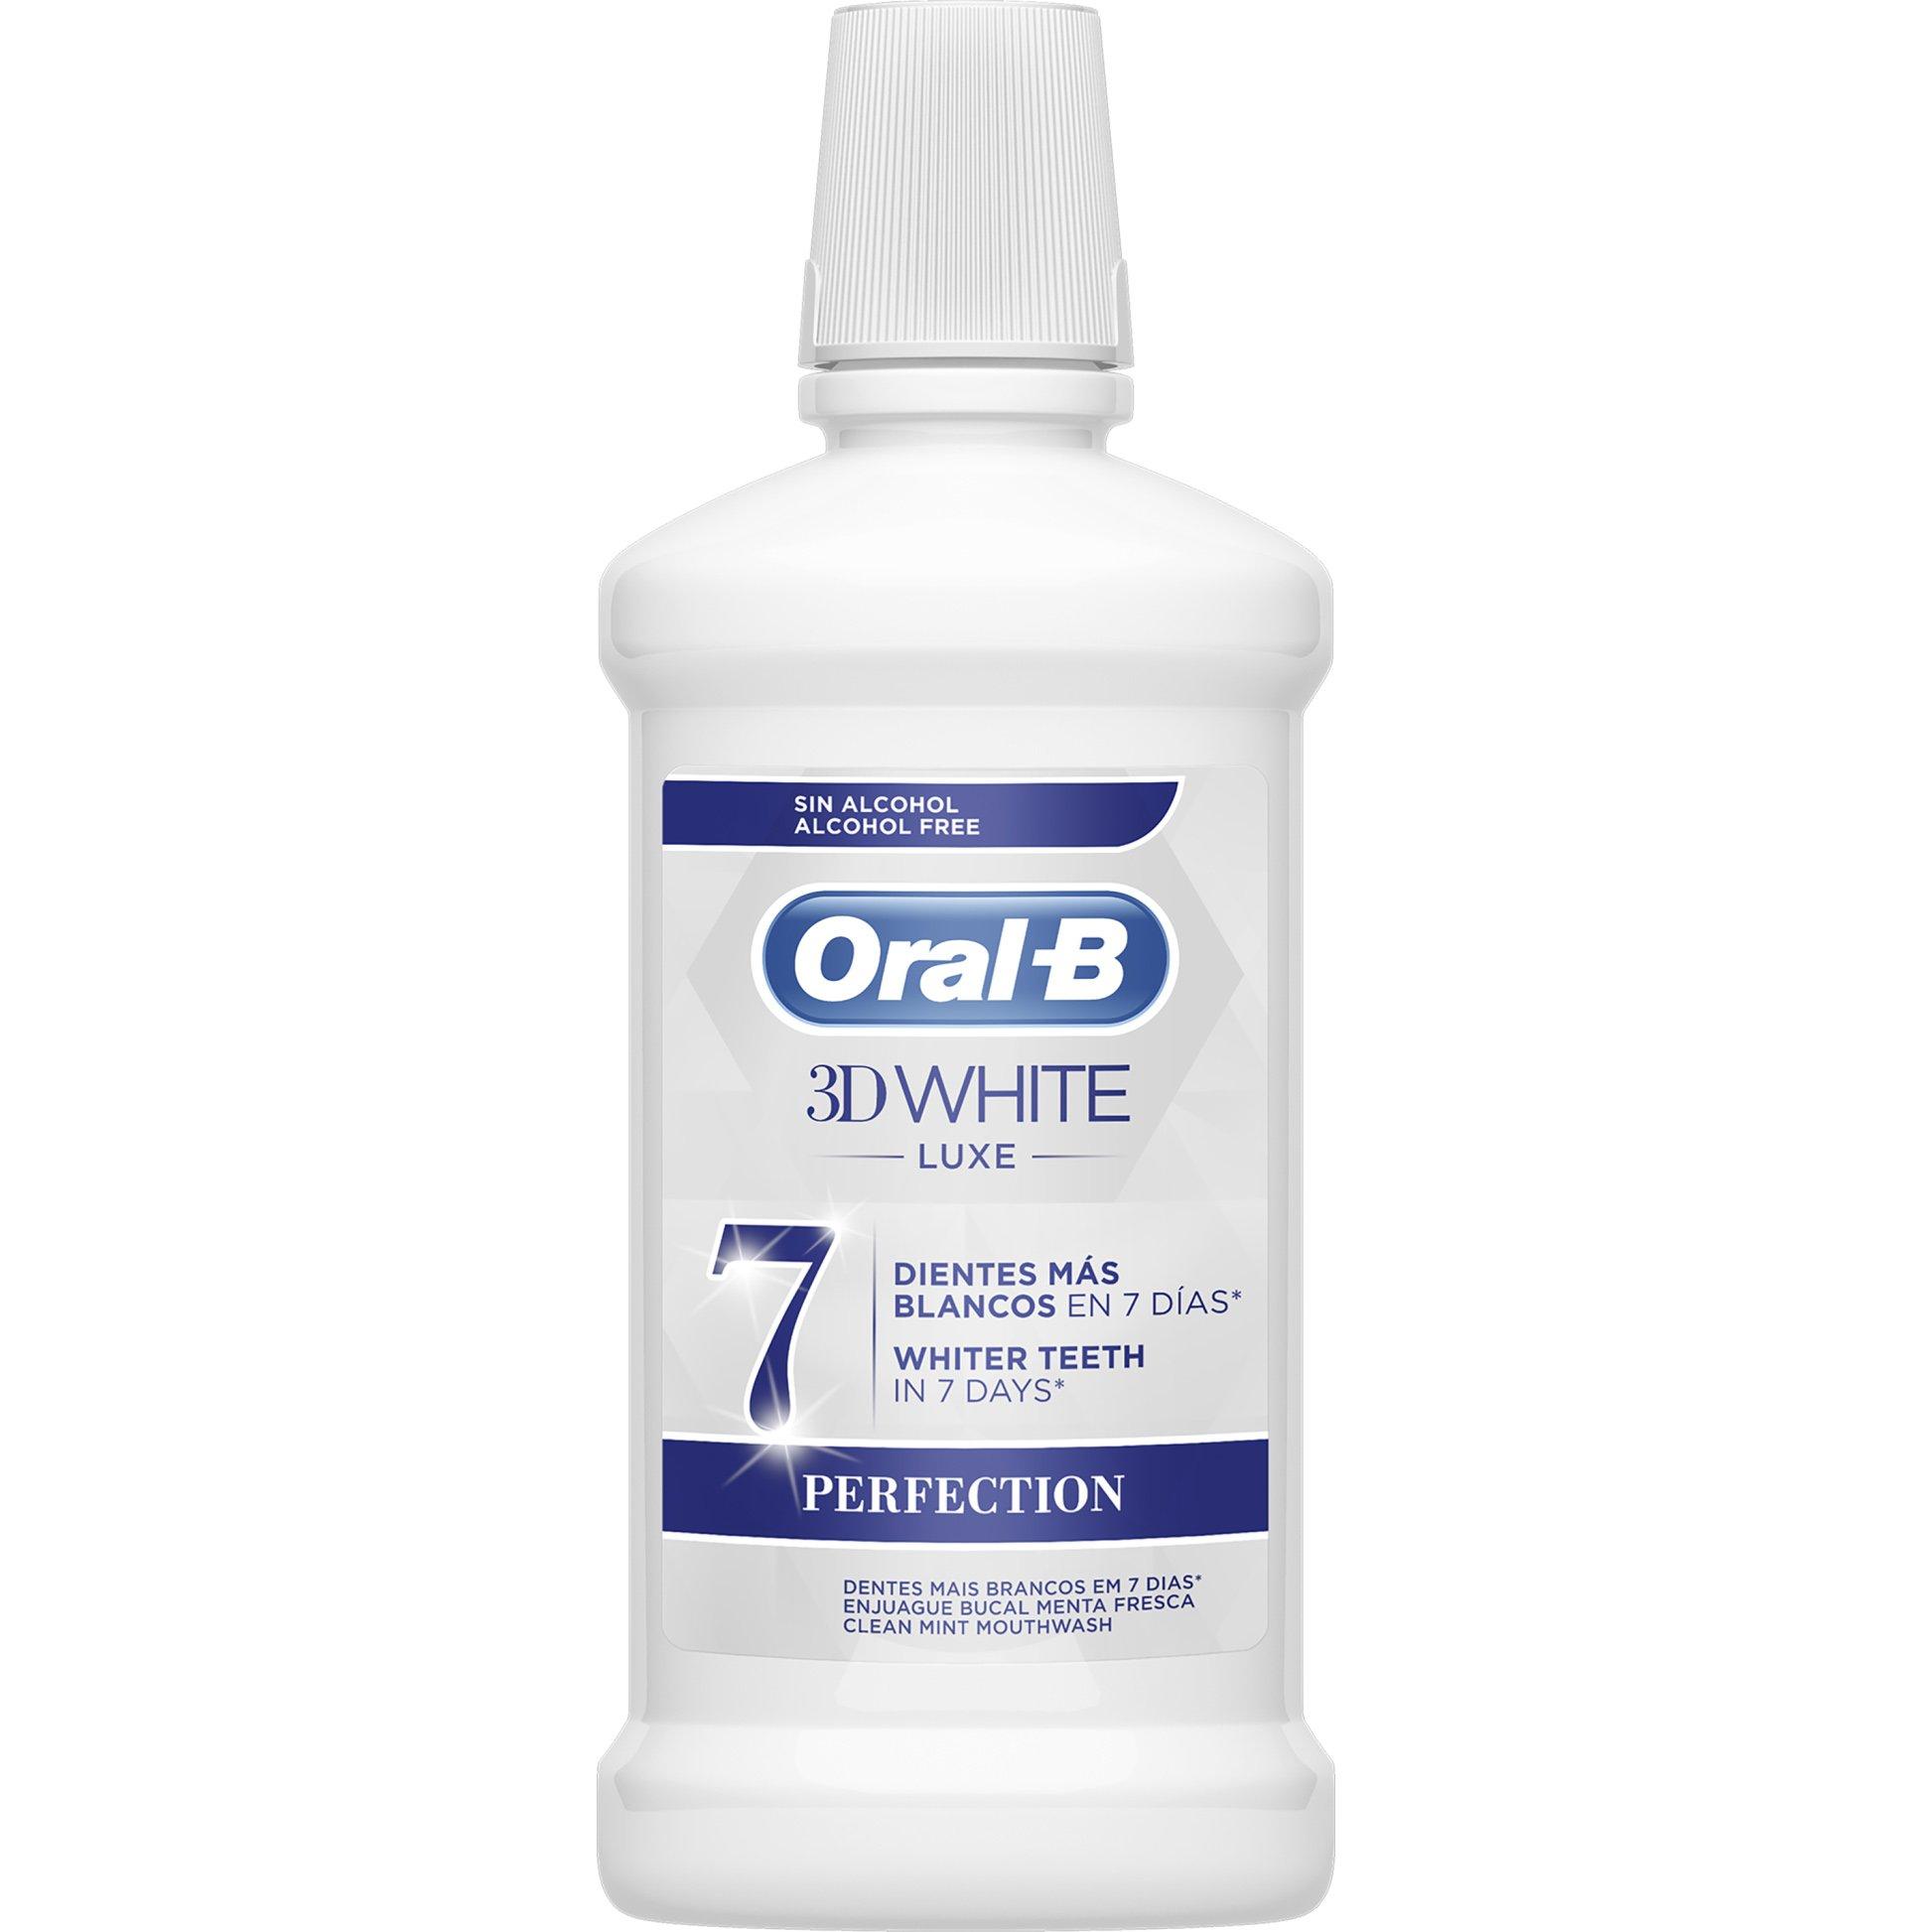 3D White Luxe 500ml – Oral-B,Στοματικό Διάλυμα για πιο Λευκά Δόντια με Άρωμα Μέντας